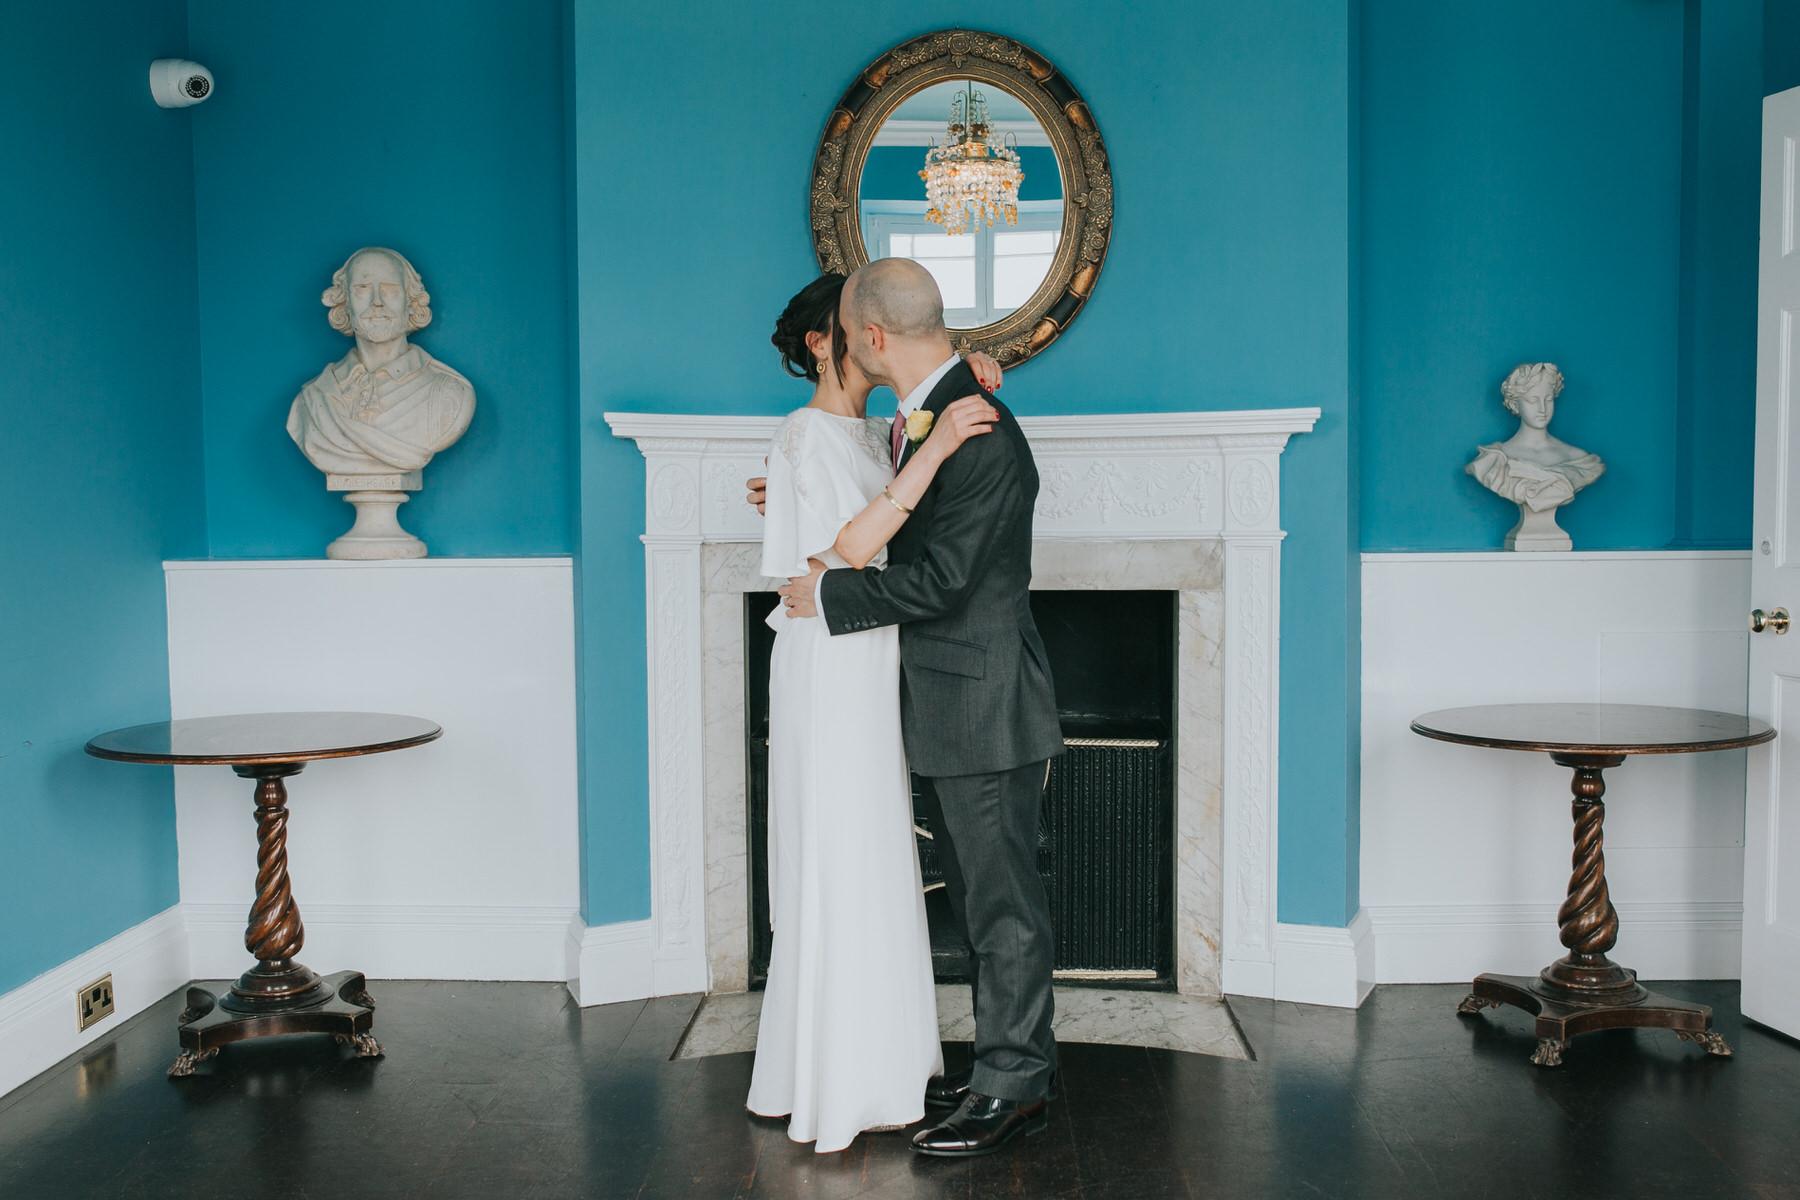 214 Belair House blue room bride groom embracing moments over mountains.jpg